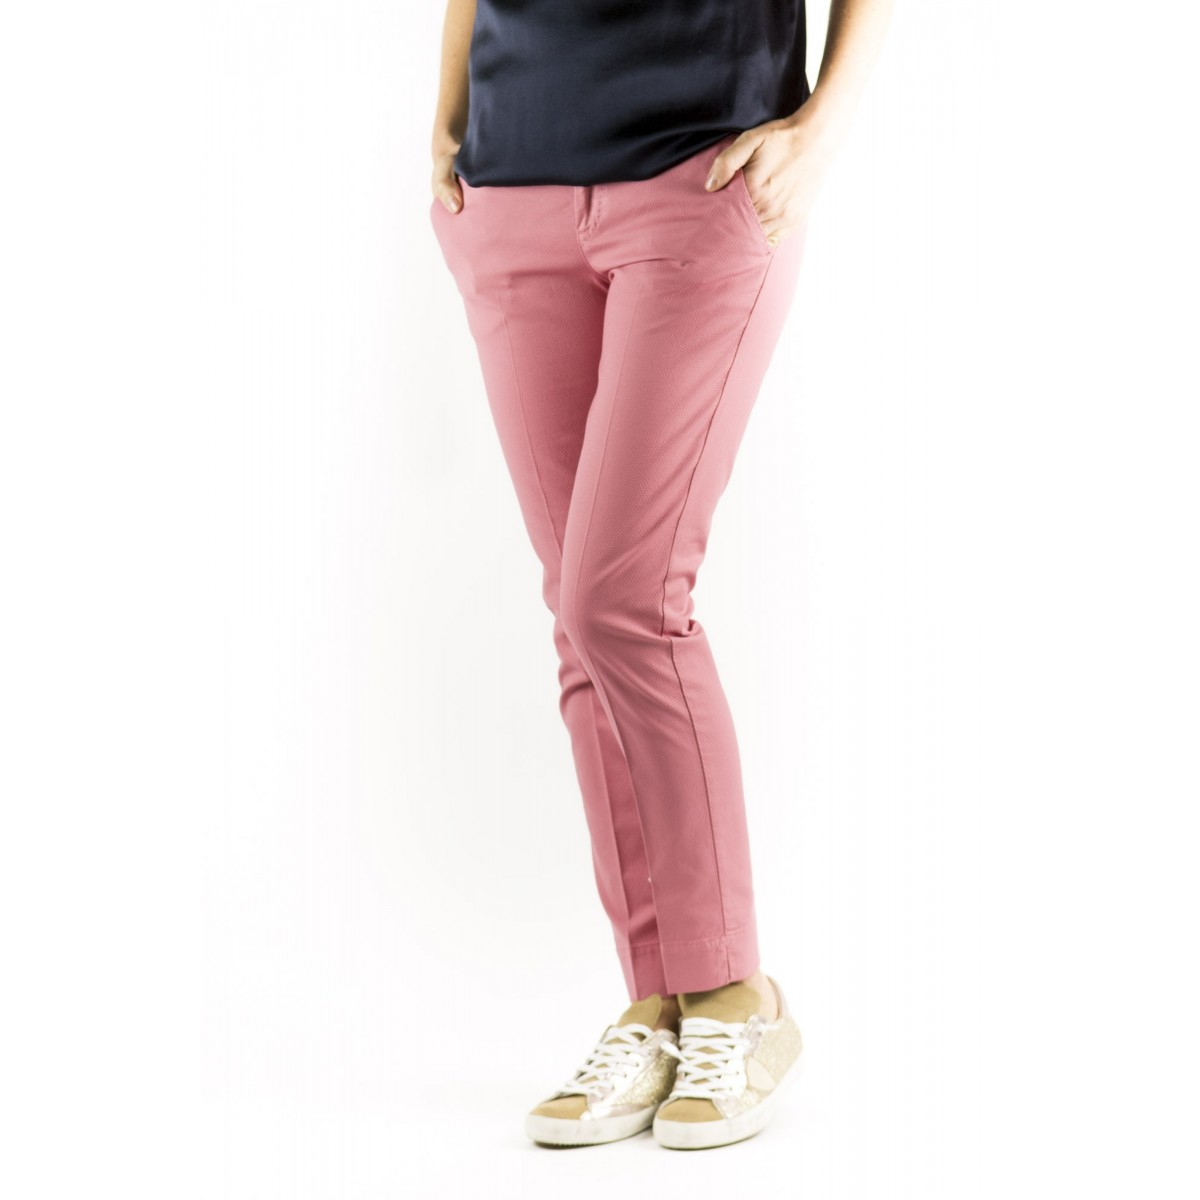 Trousers PTW Woman - VTNY Ts63 Piquet Cotone Strech